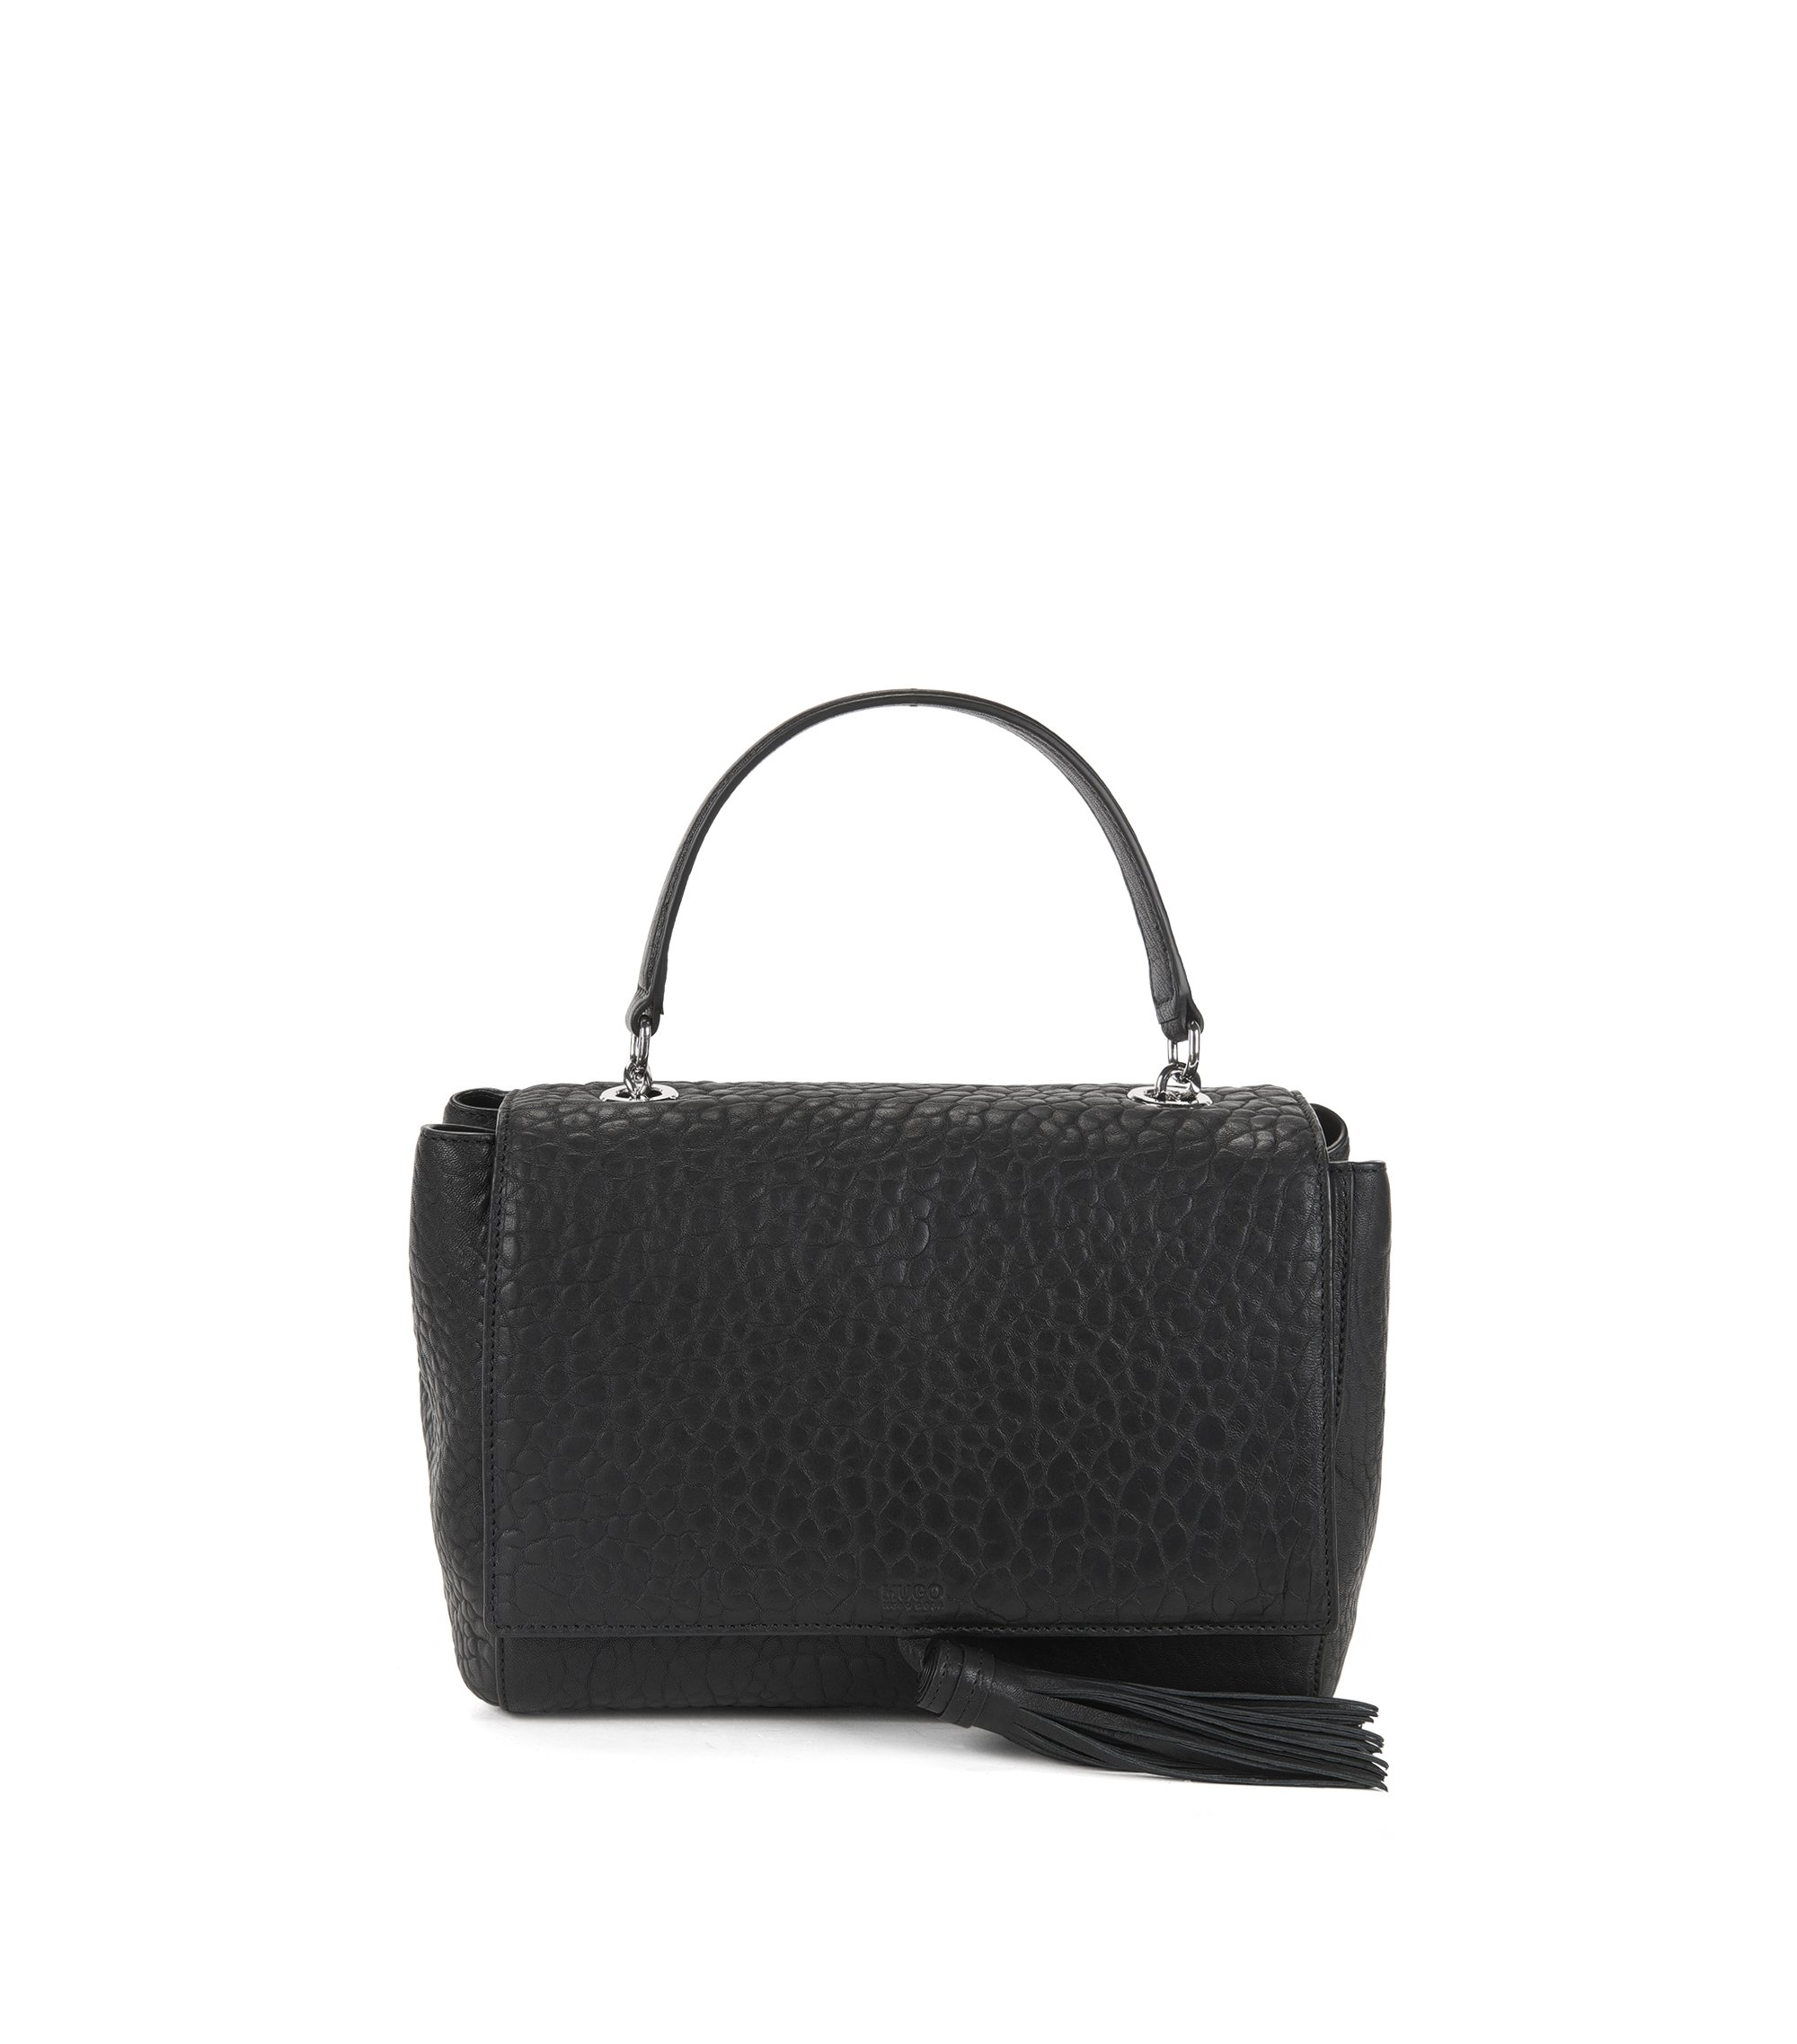 Top-handle handbag in Italian leather, Black